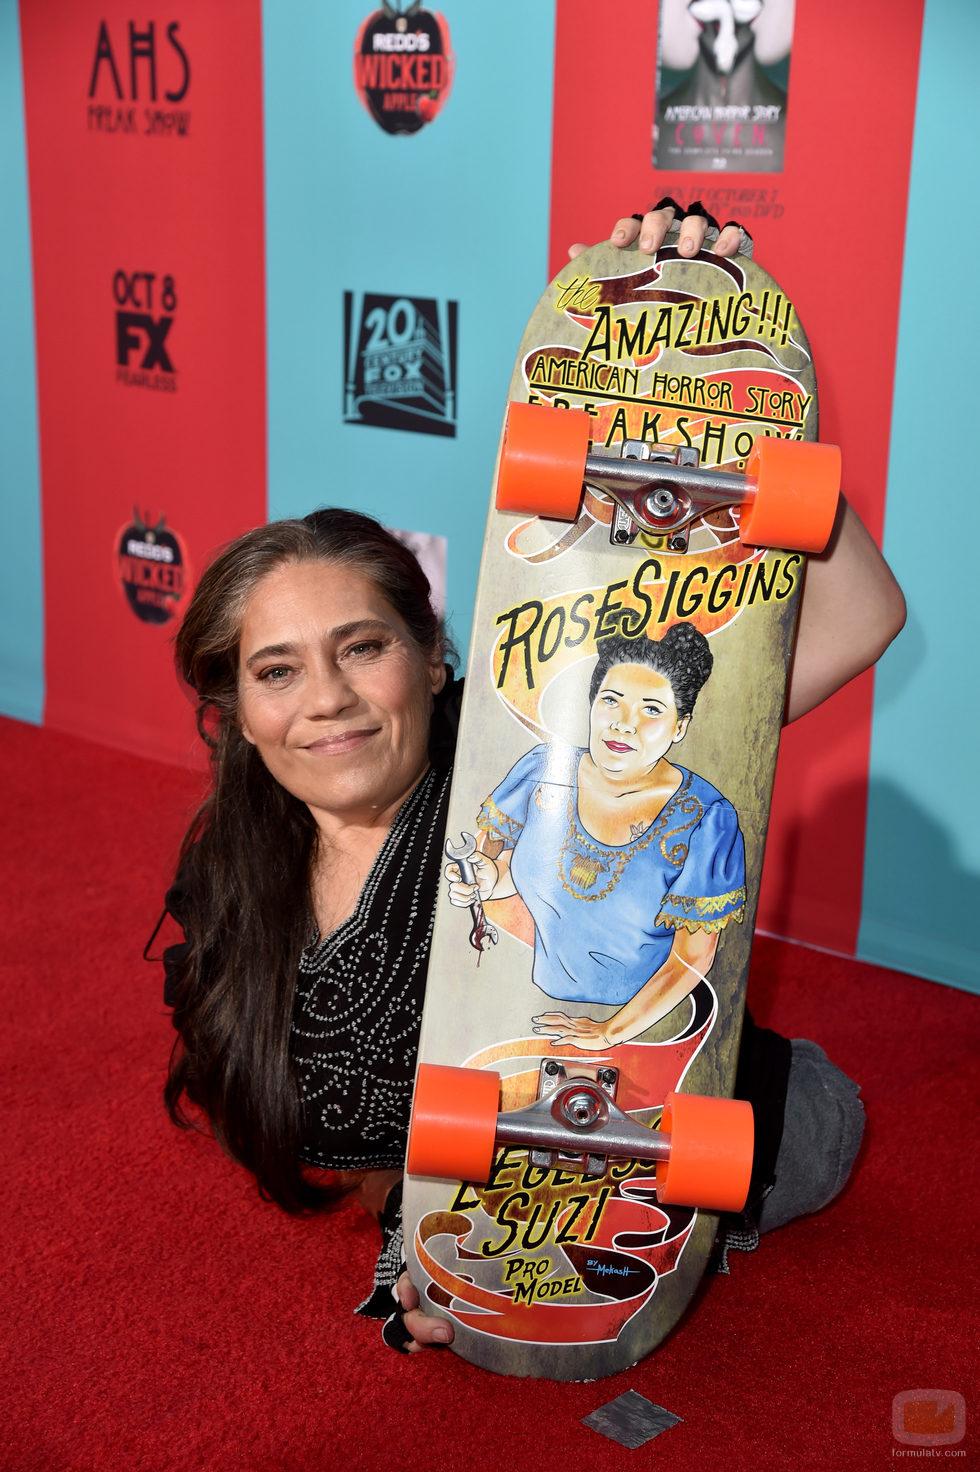 Rose Siggins en la première de 'American Horror Story: Freak Show'